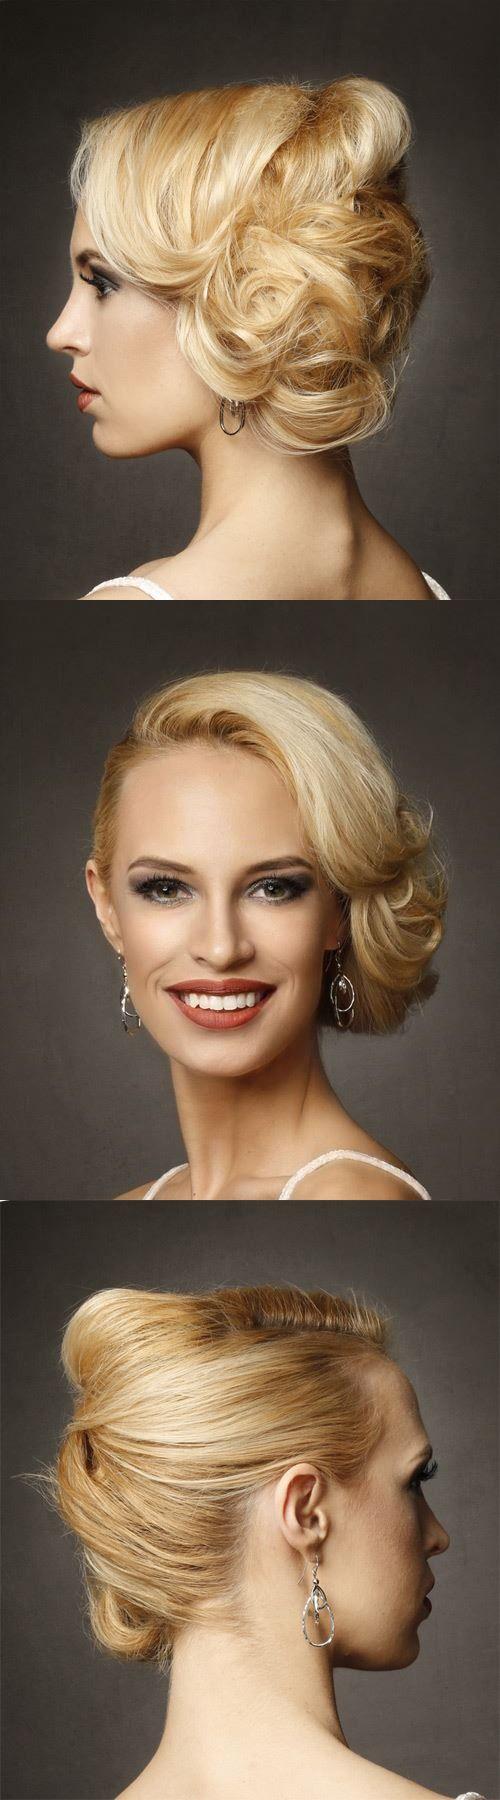 Light Blonde Formal Updo